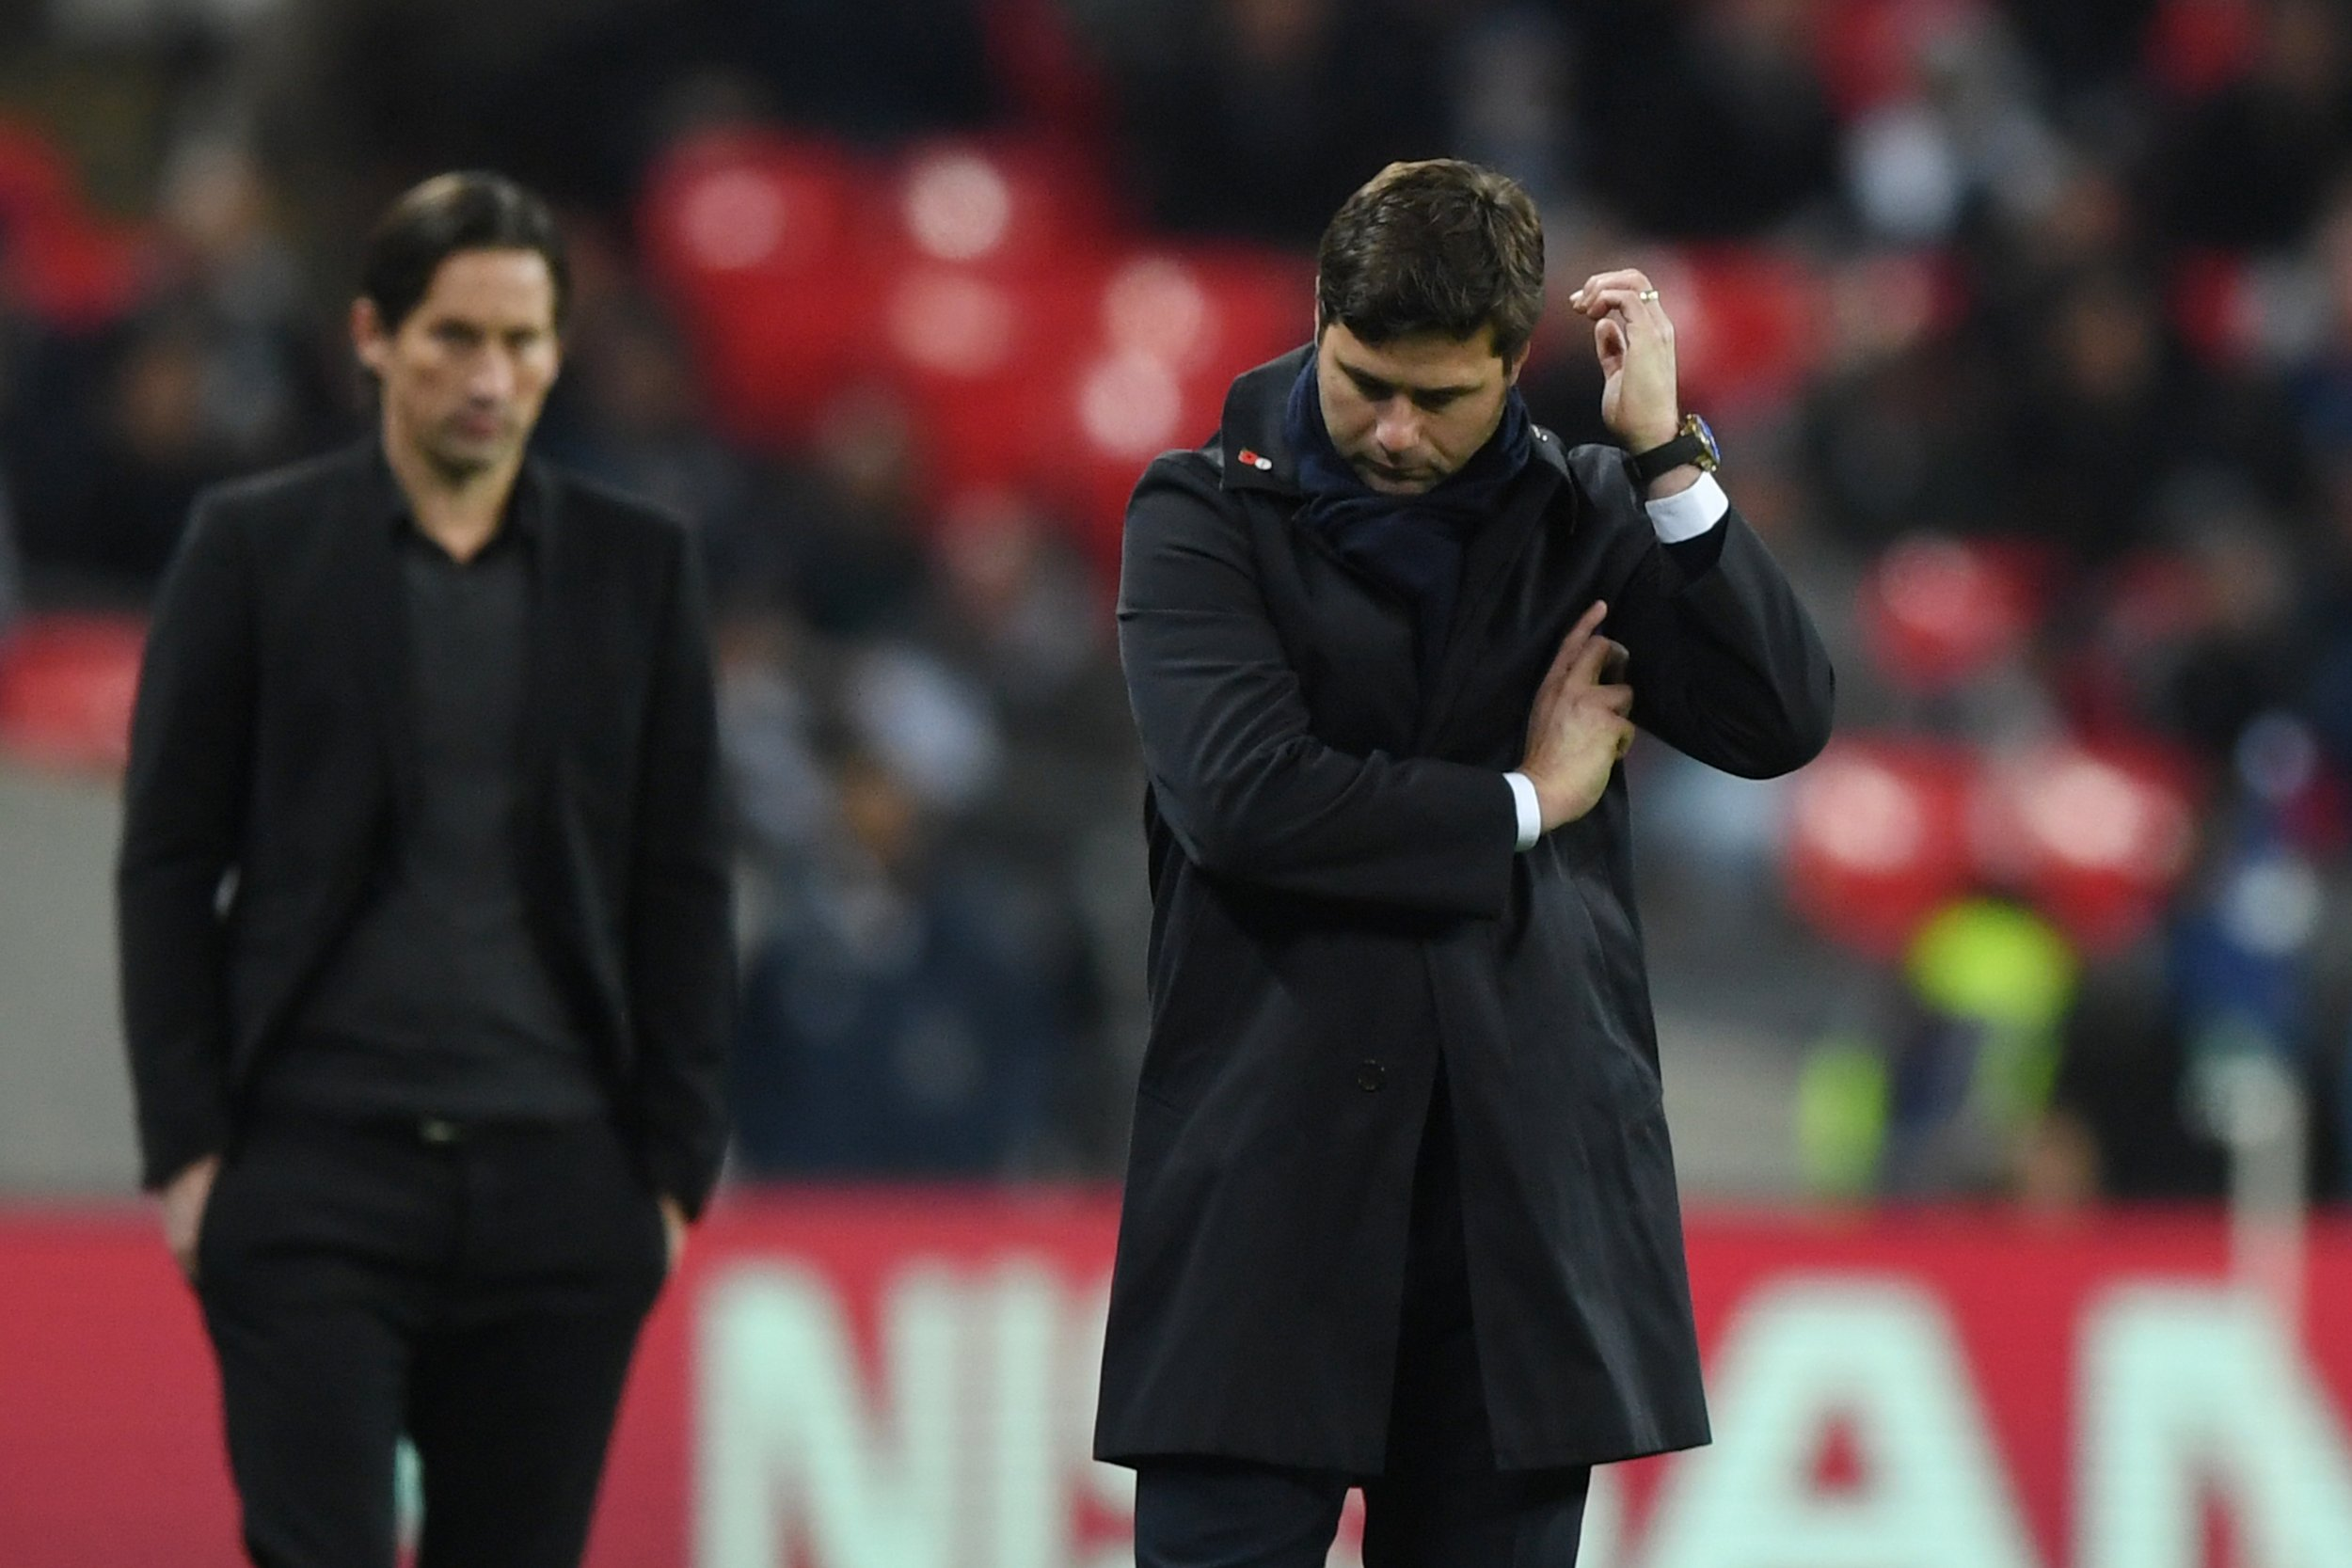 Mauricio Pochettino Tottenham Hotspur S Champions League Form At Wembley Has Been Embarrassing